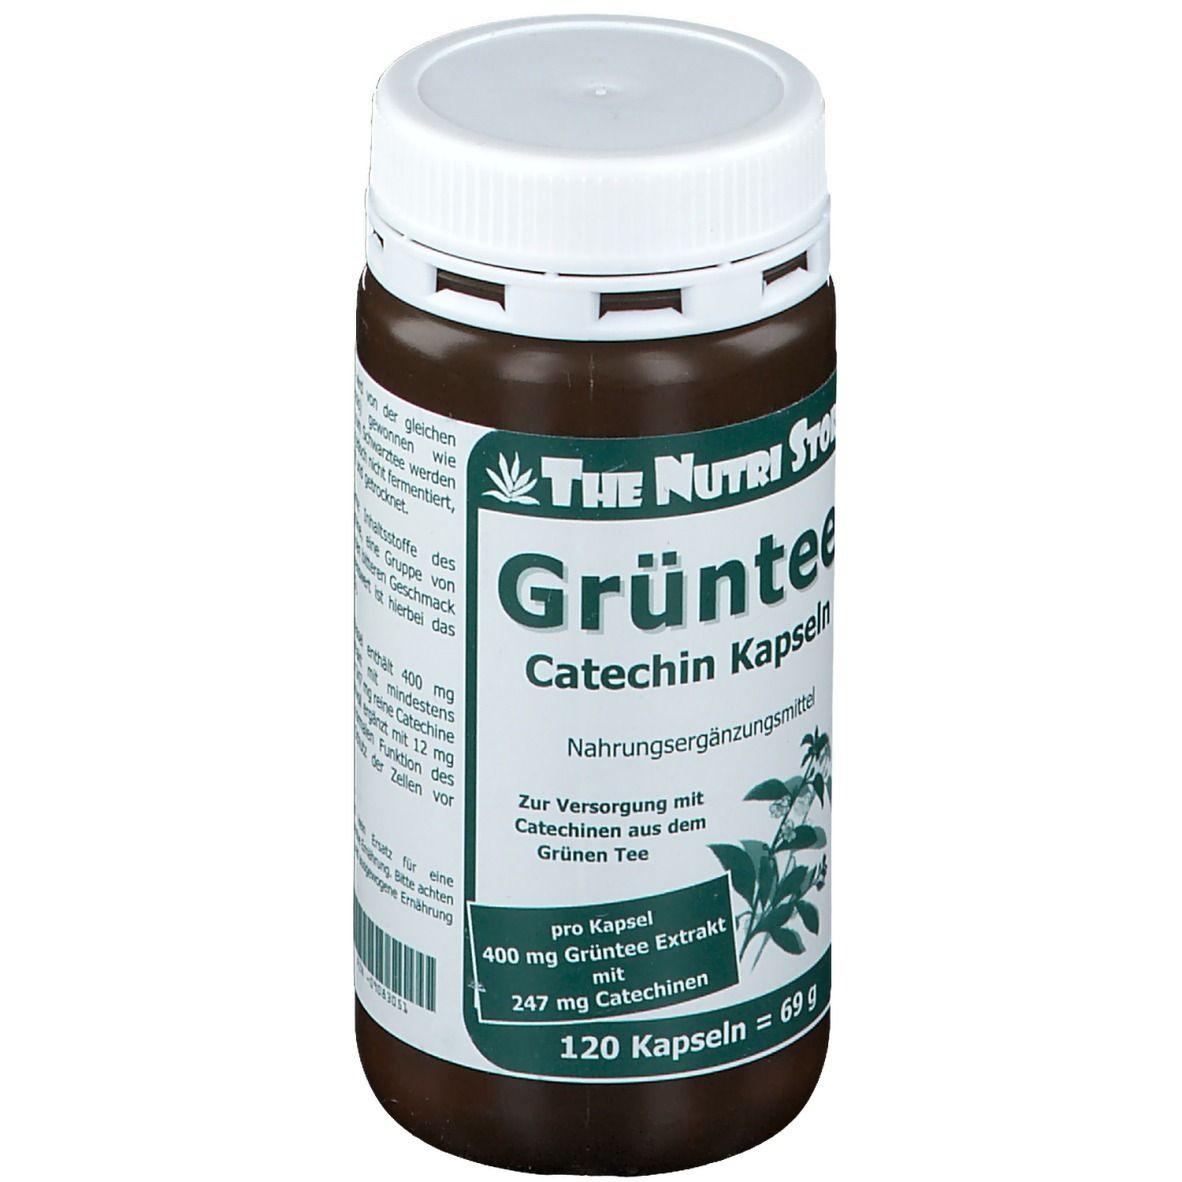 Grüntee 400 mg Catechin